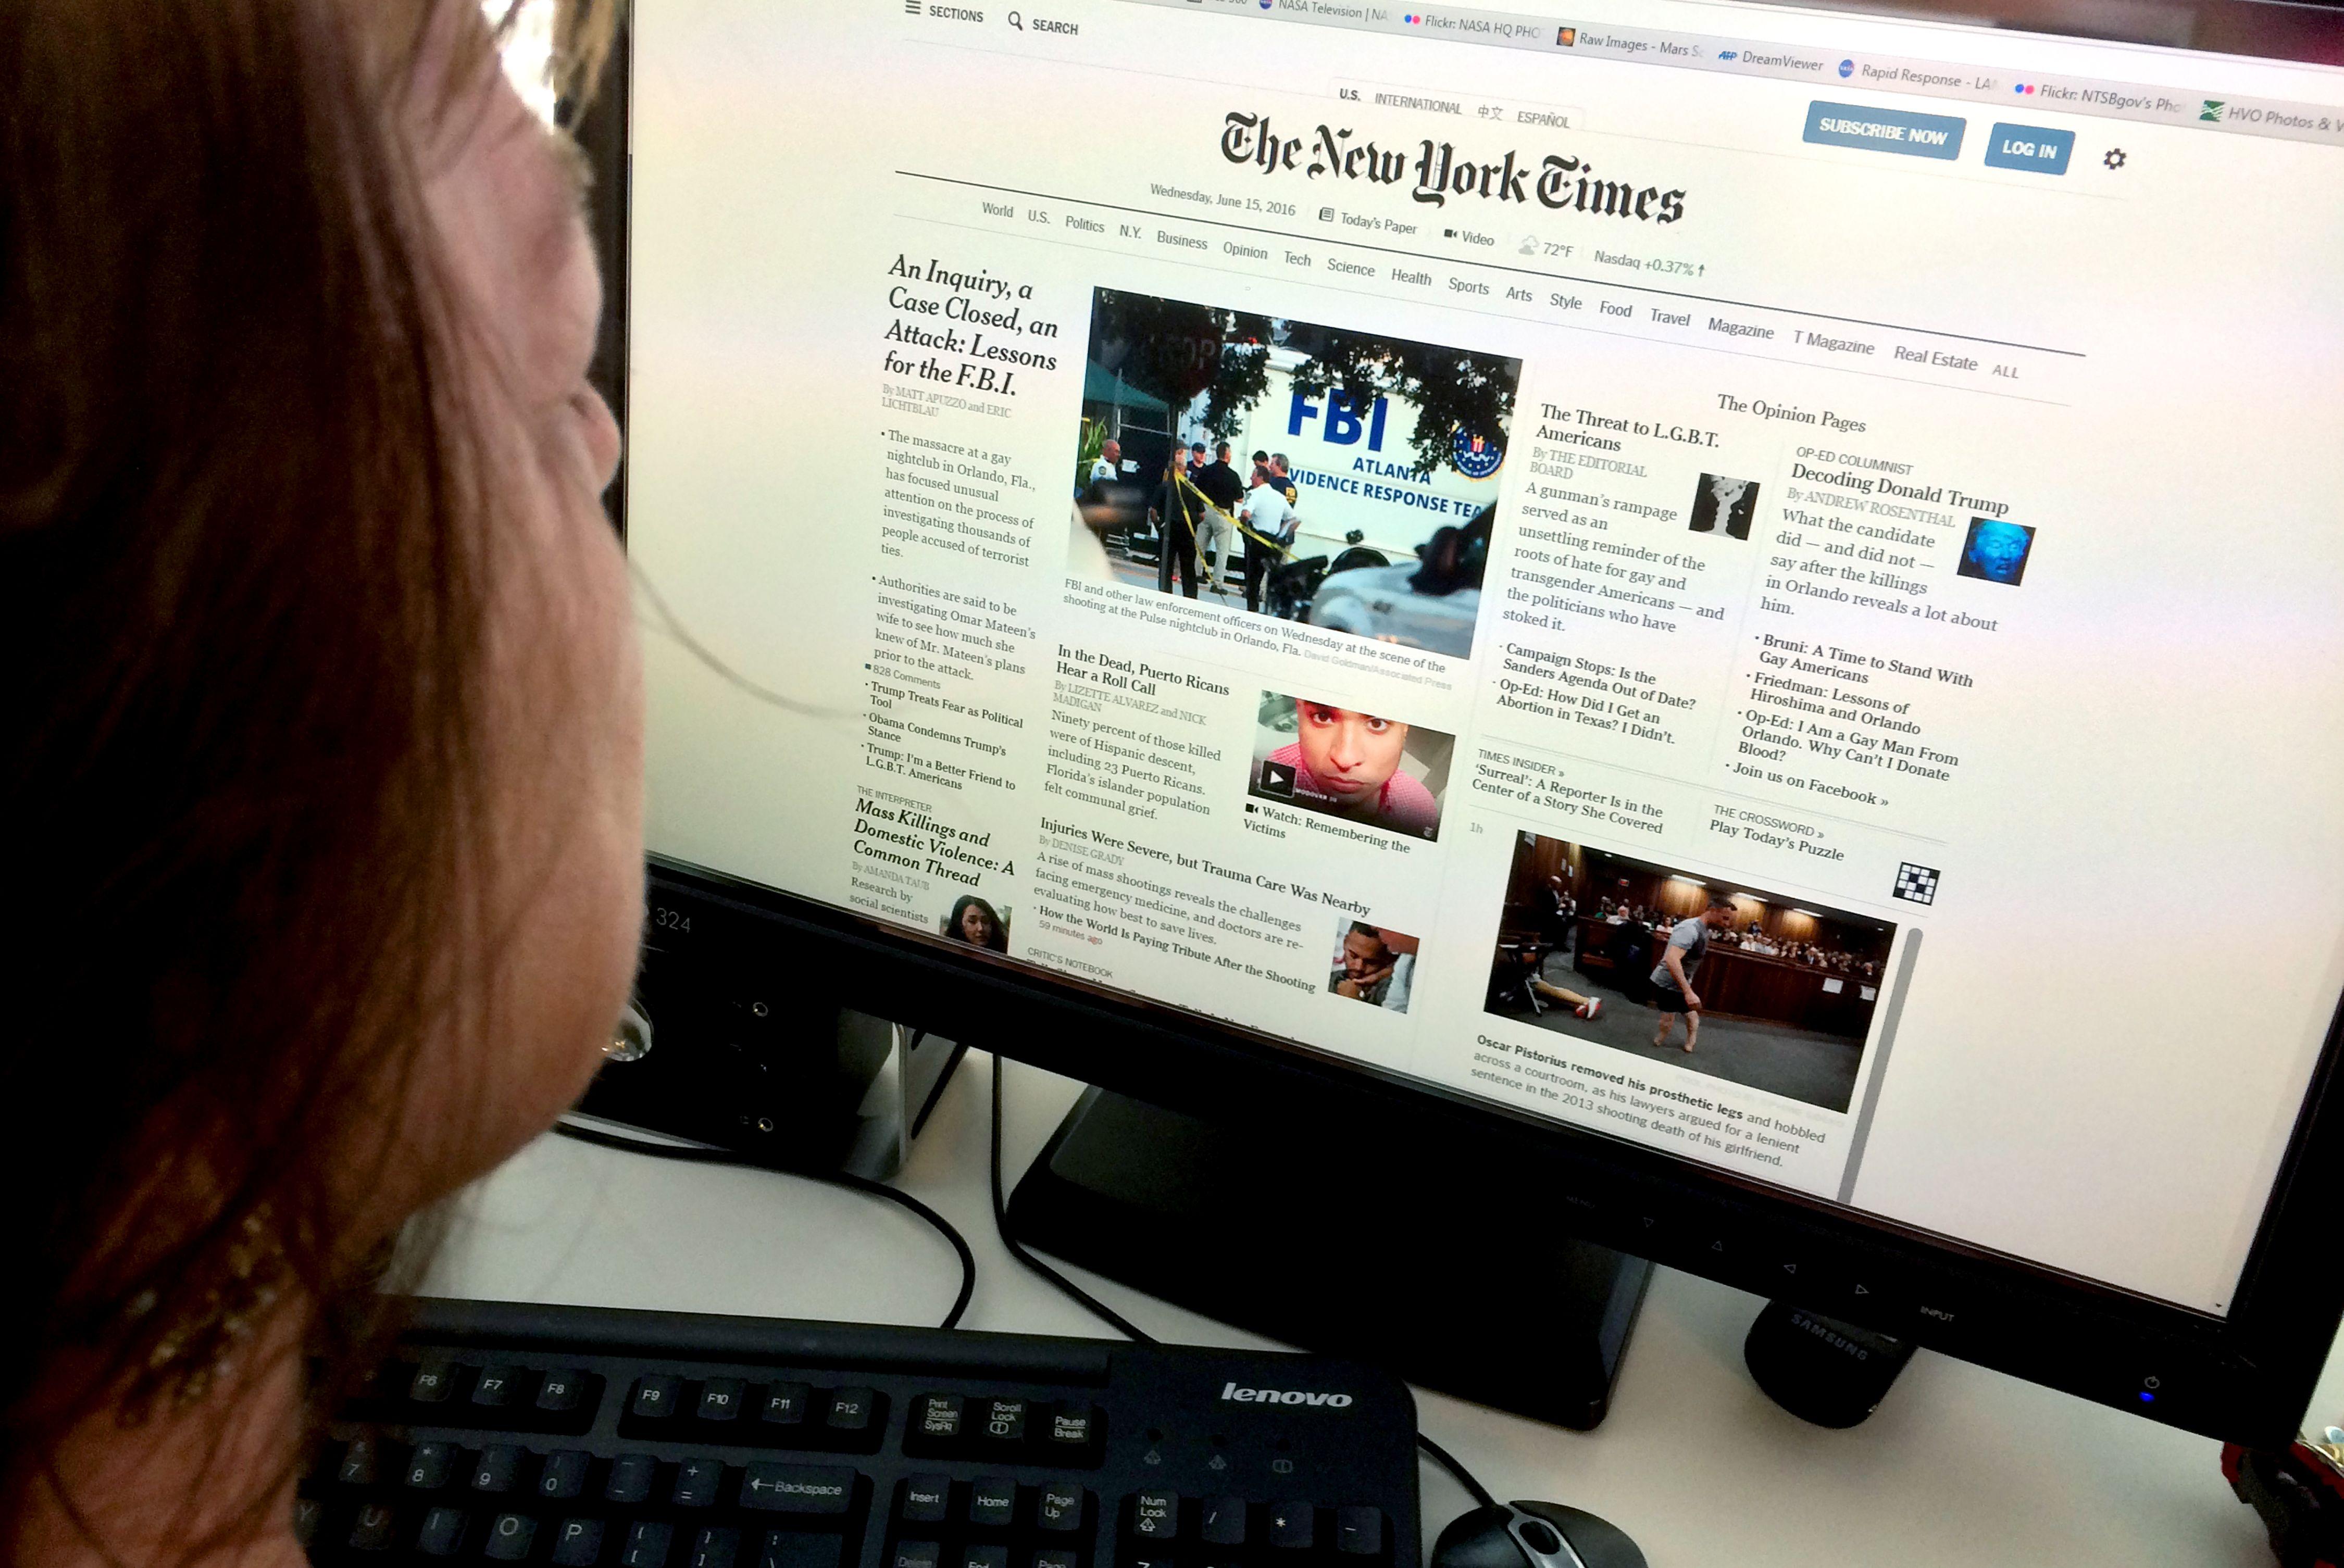 US-MEDIA-IT-INTERNET-LIFESTYLE